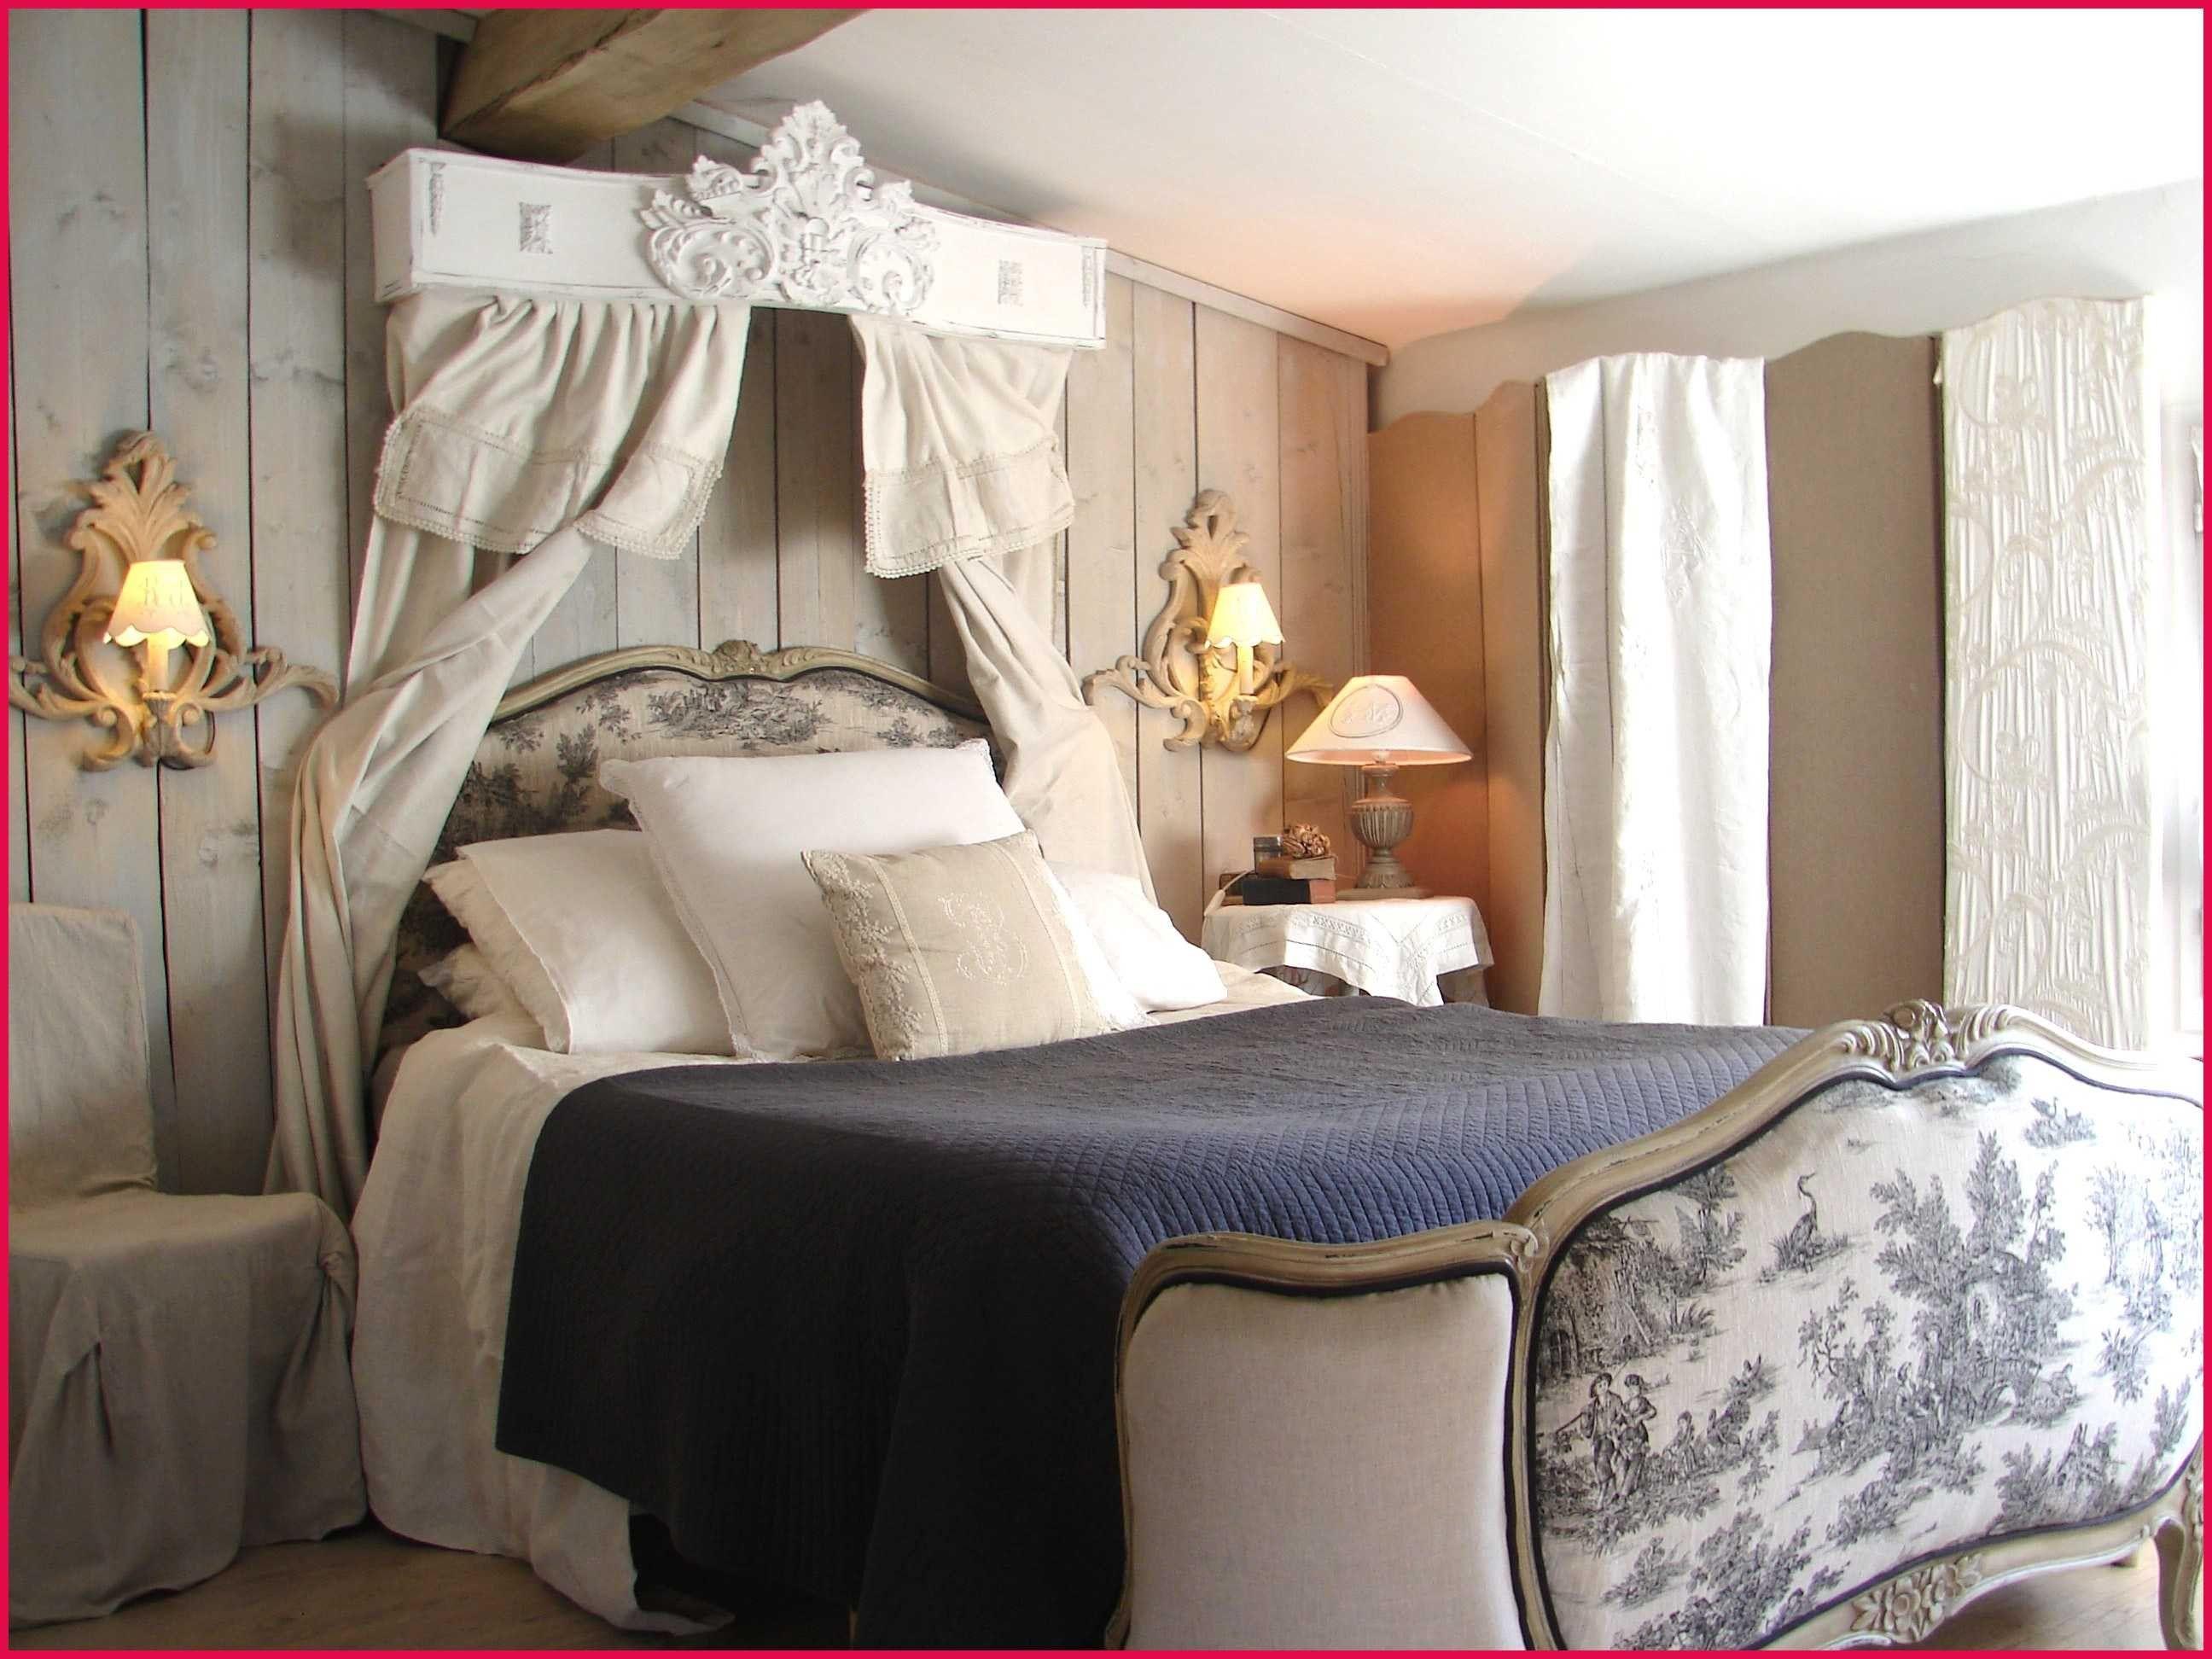 Inspirer 40 De Deco Style Anglais Romantique Concept Chambre A